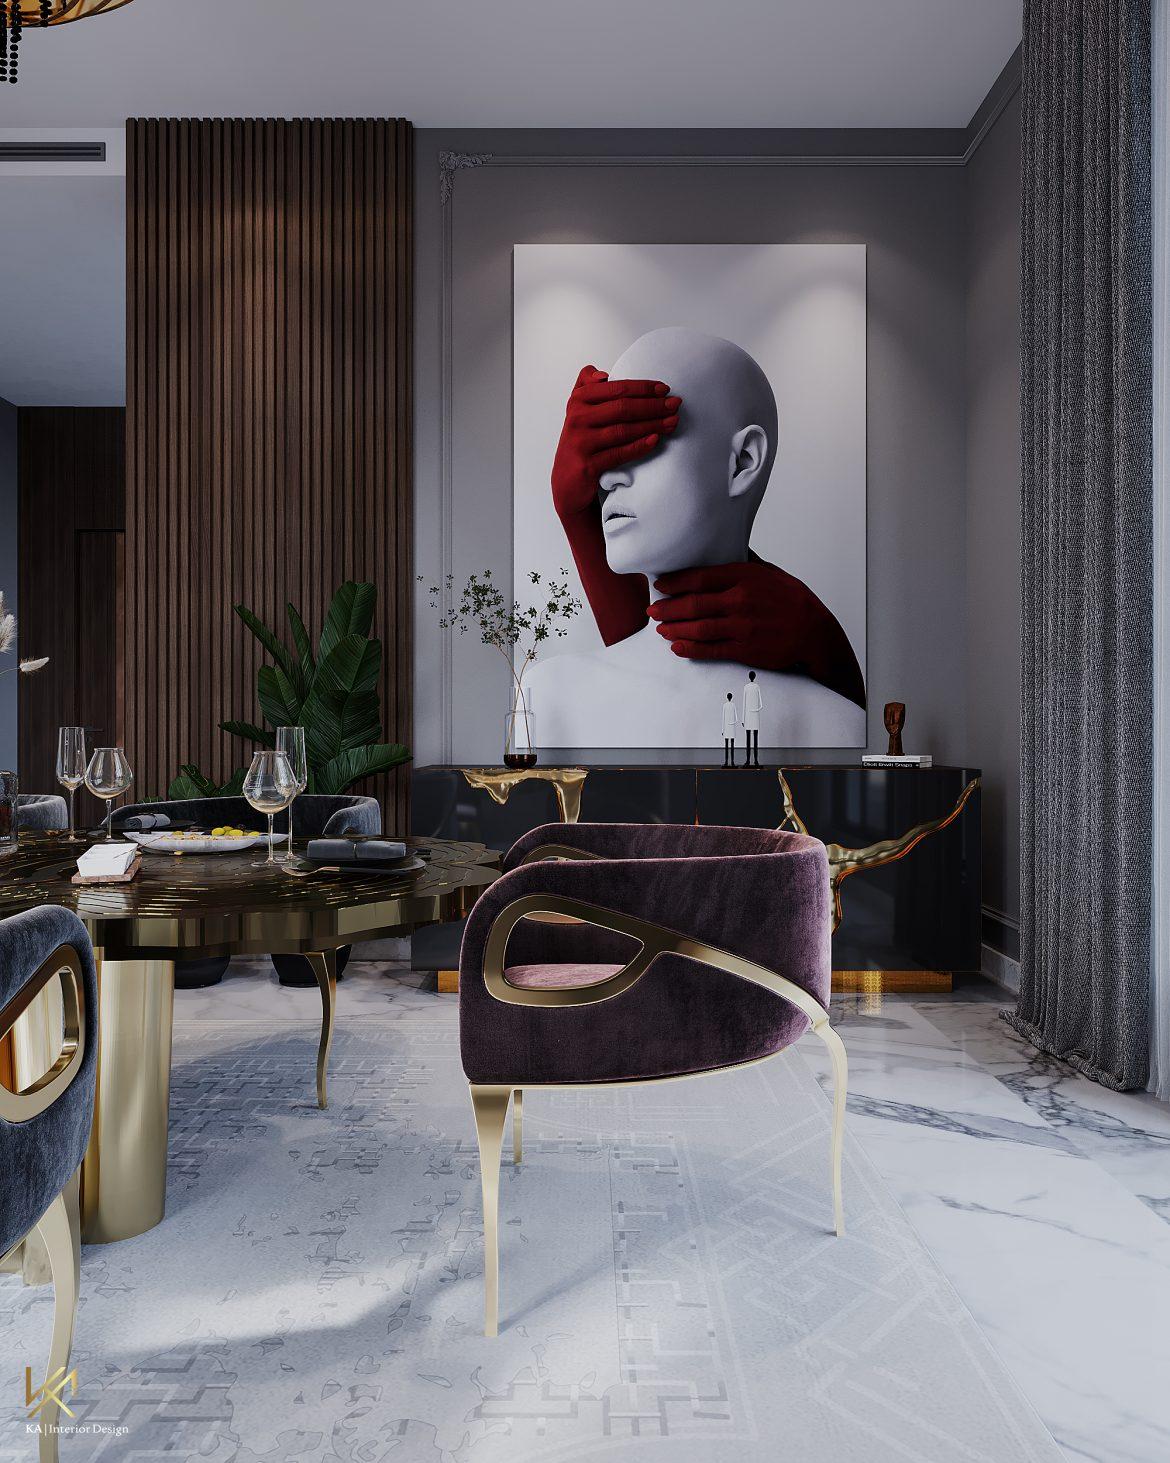 Covet House x K.A Interior Design: A Opulent Modern Classic Villa in Riyadh  Covet House x K.A Interior Design:  A Opulent Modern Classic Villa In Riyadh covet house k a interior design lavish modern classic villa riyadh 6